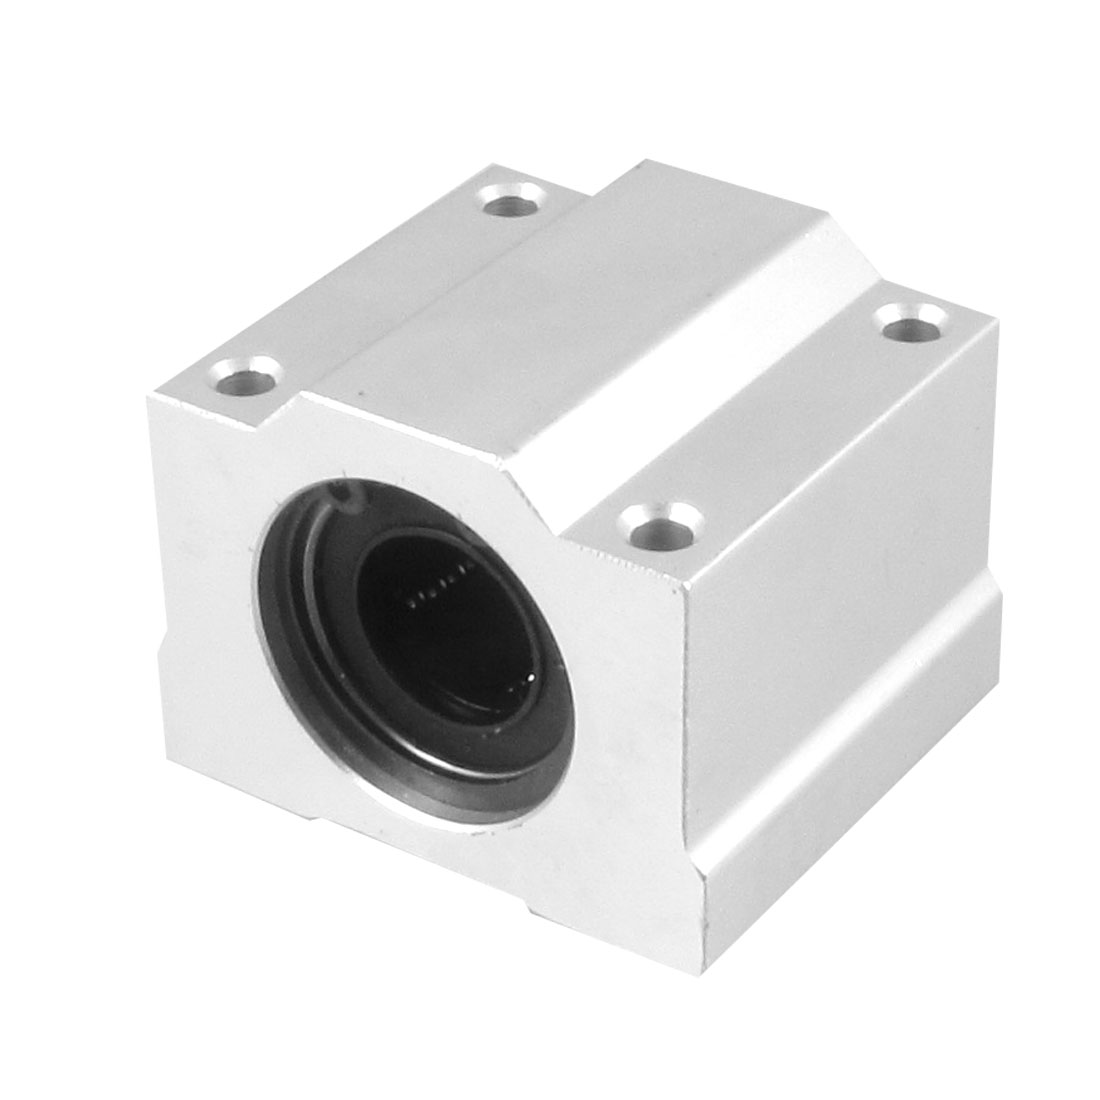 SCS16UU 16mm Linear Motion Ball Slide Bearing CNC